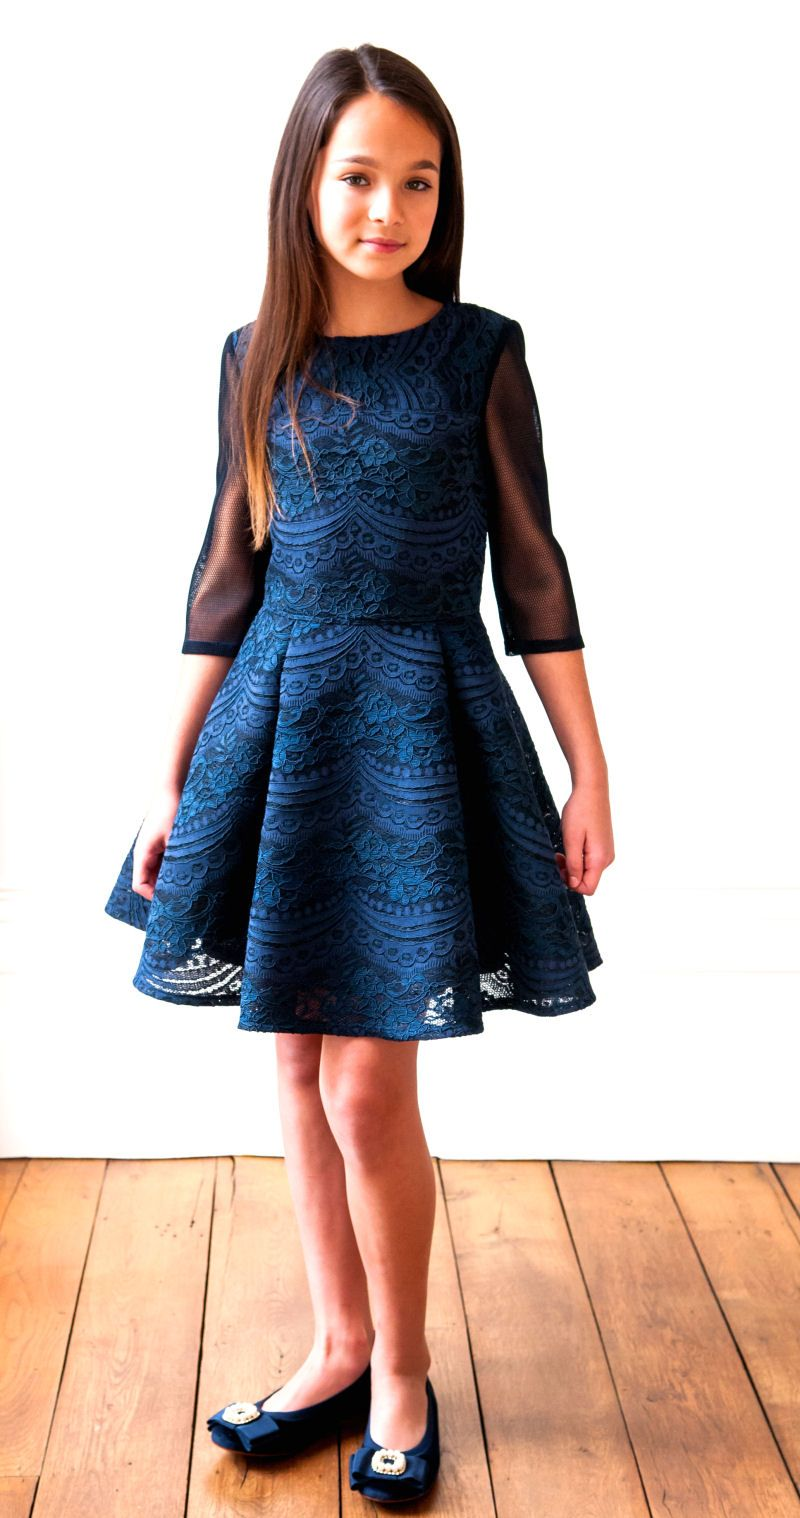 fb39e4c1e099a David Charles Navy lace Overlay Tween Party Dress 11 12 15 ...